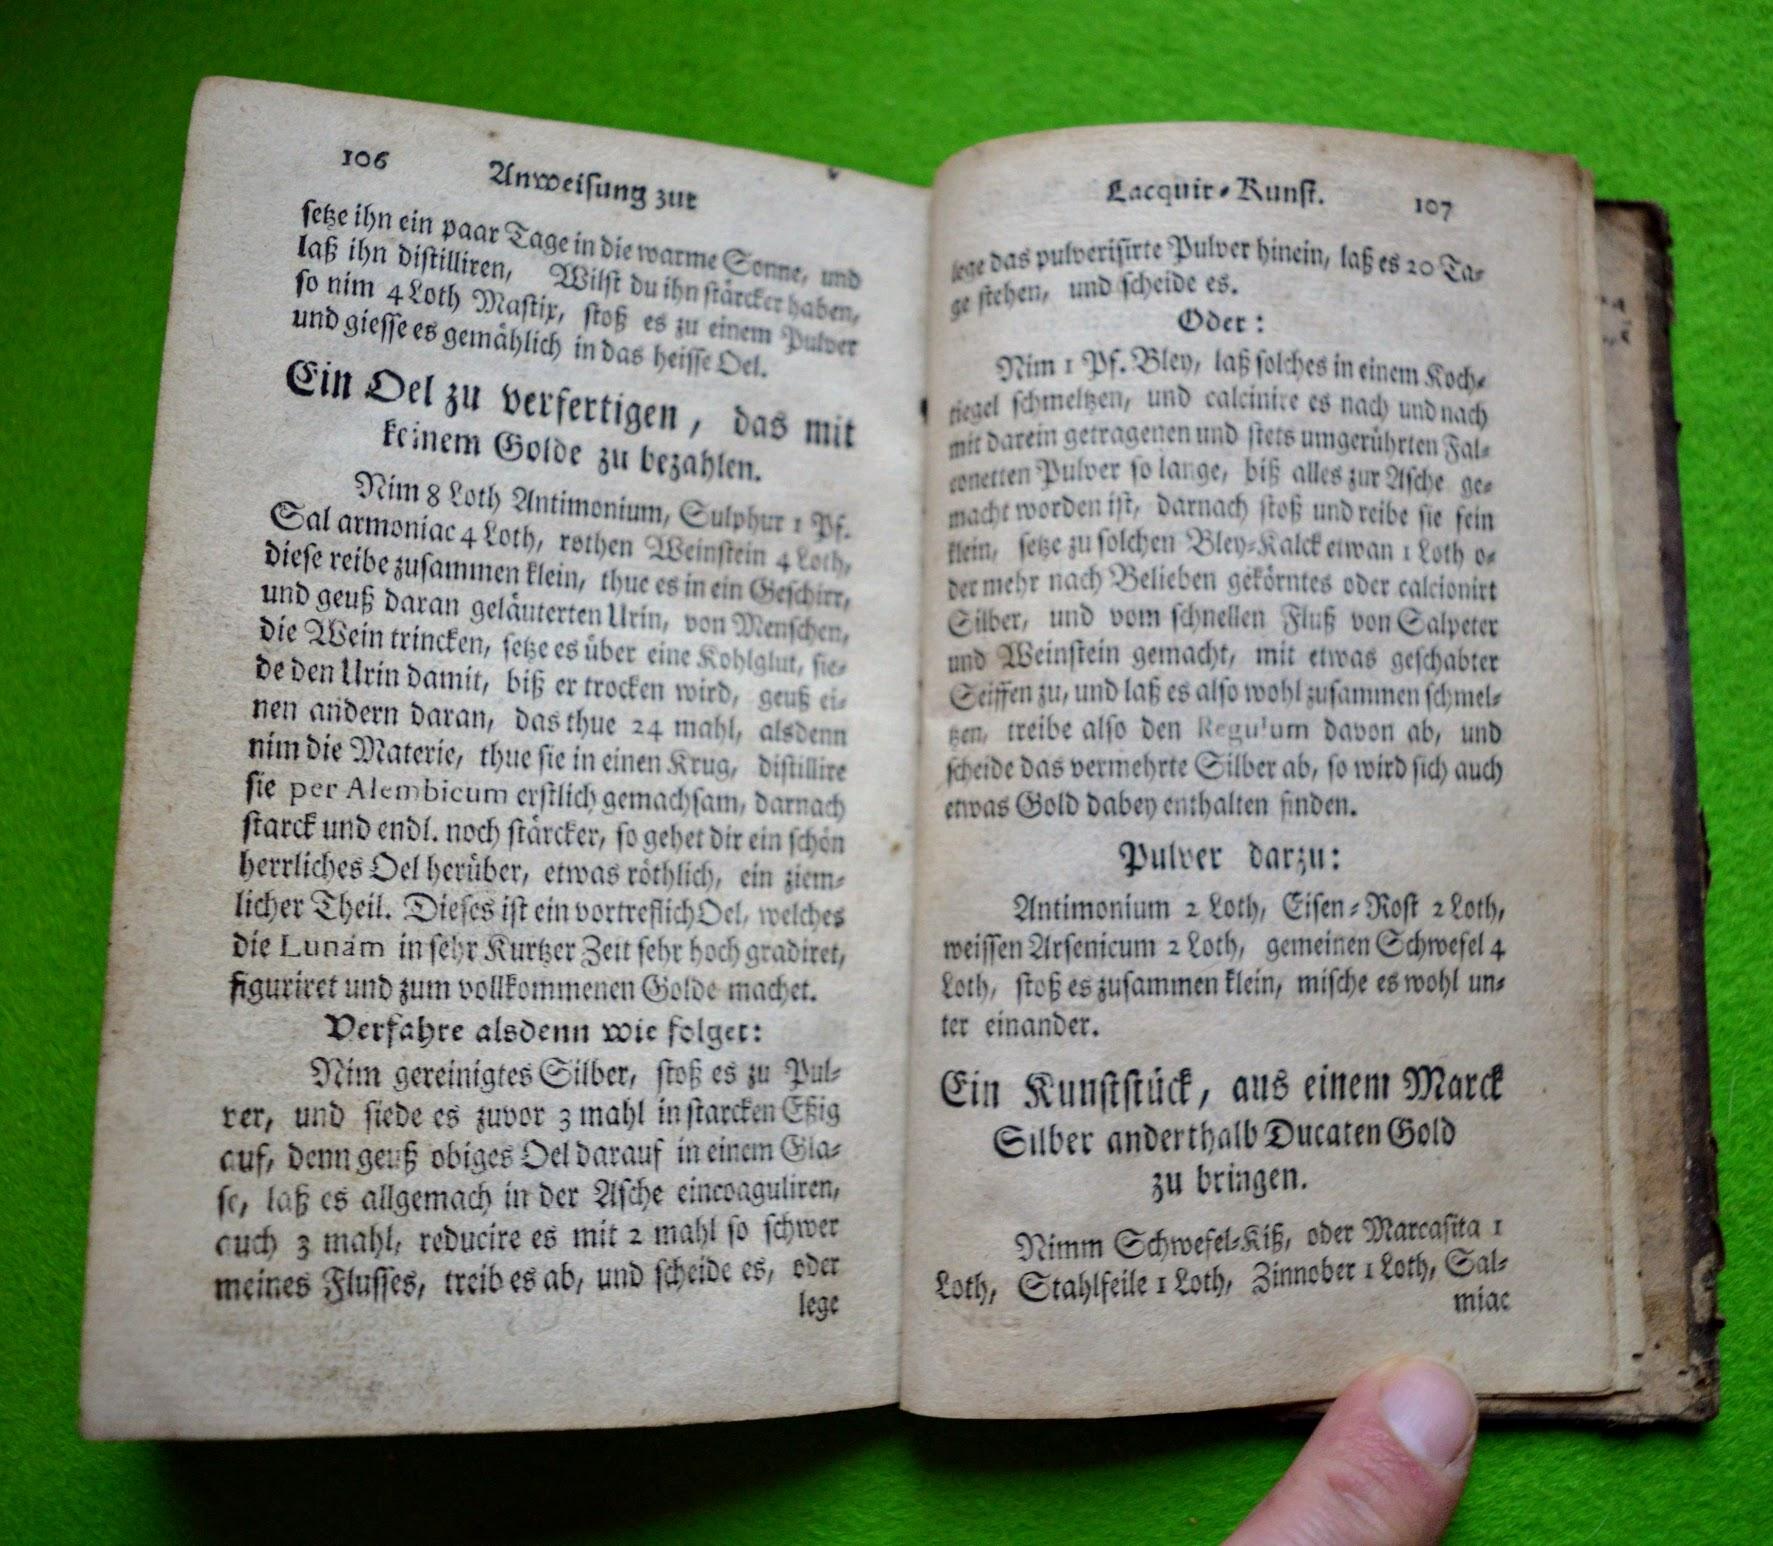 Lackierbuch 1755 - Aus Silber Gold machen